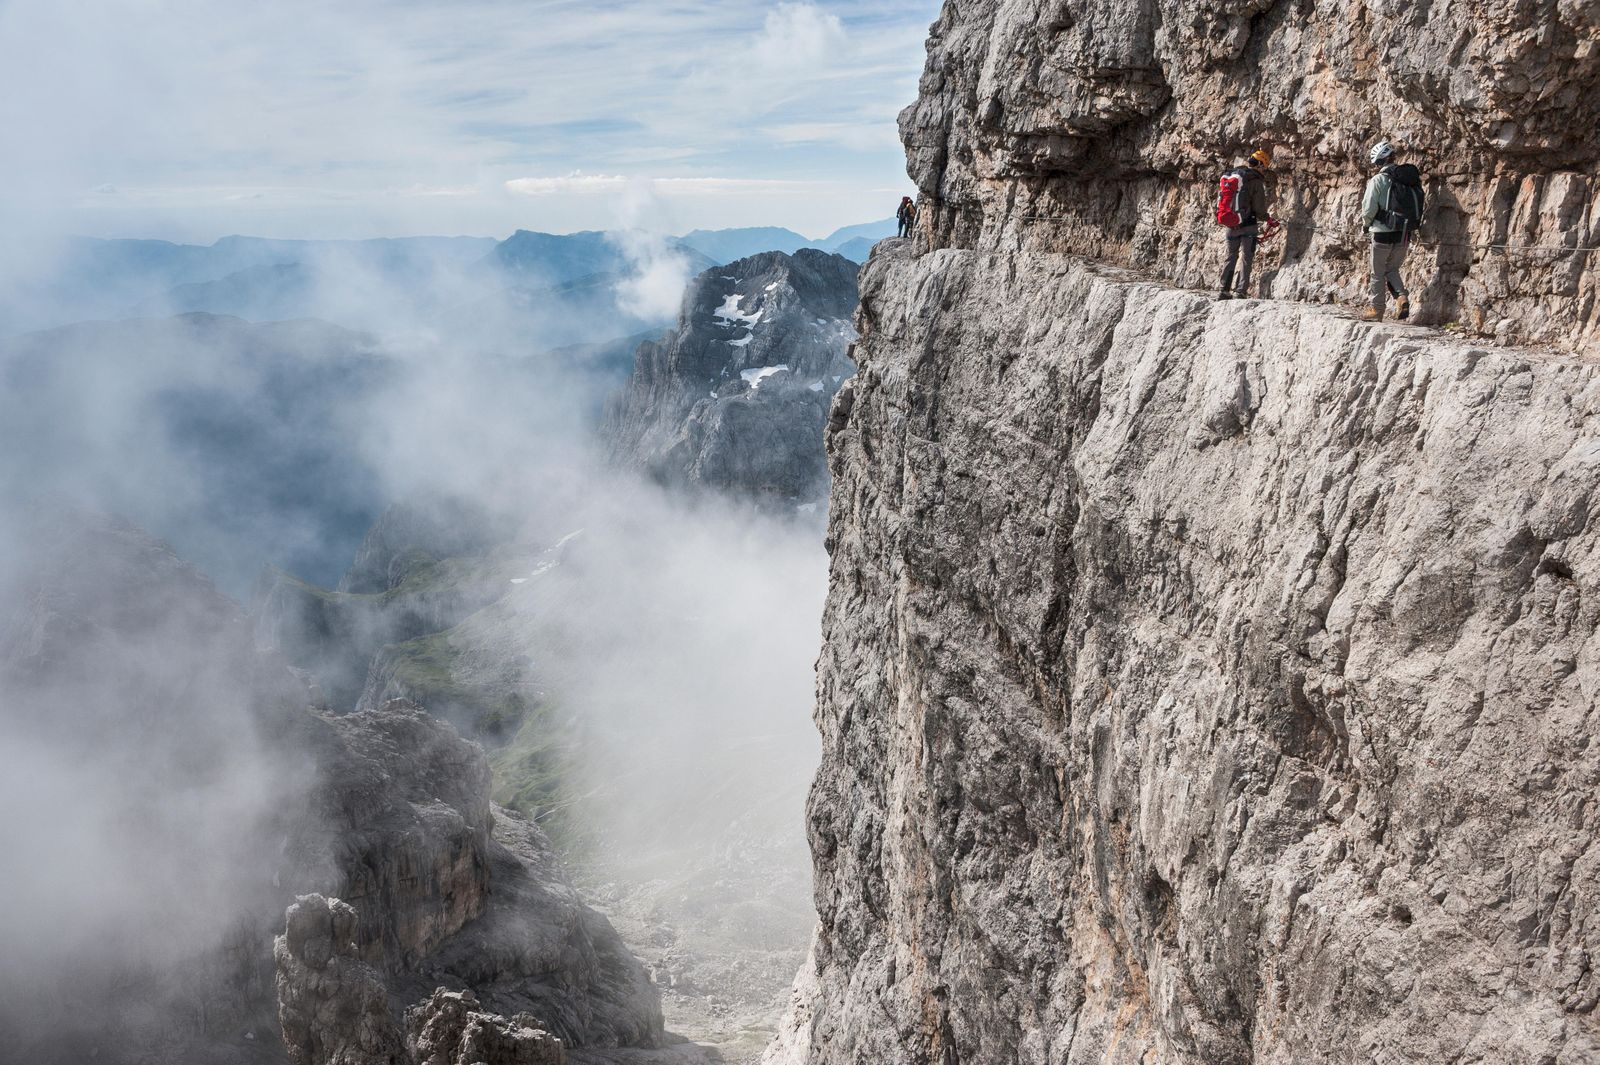 Climbers on rock band, via ferrata Bocchette Centrali, no. 305, Adamello-Brenta nature park, Brenta group, Dolomites, Trentino